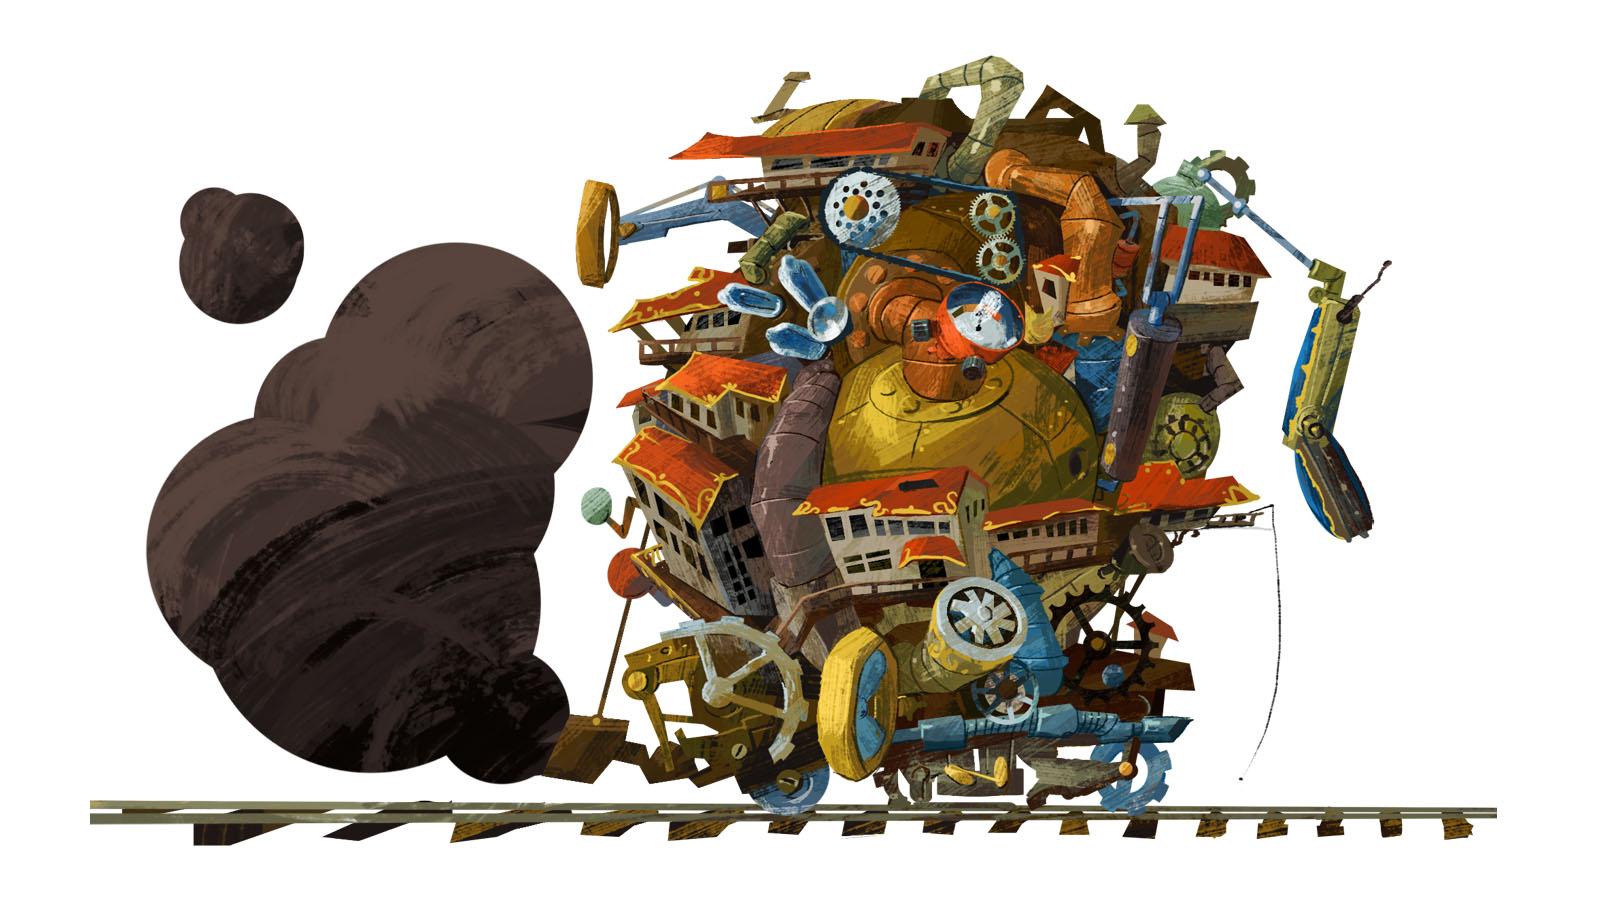 Plato 3000 von Cambridge Games Factory, Motiv: Dystopie